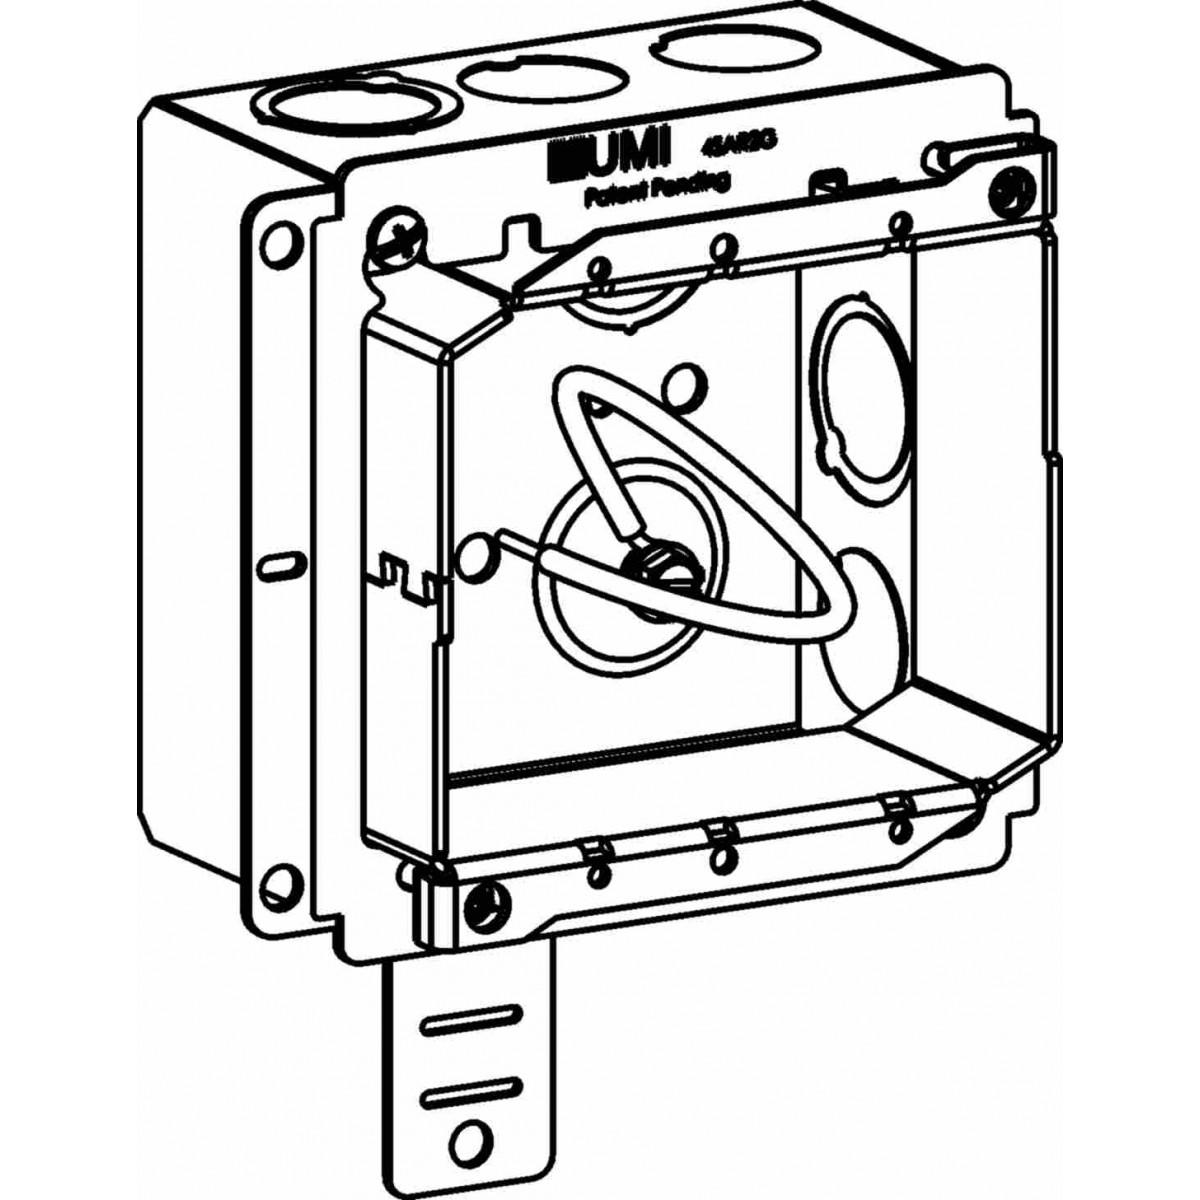 4sdb-mko-ar2g - 4 u201d  4s  boxes